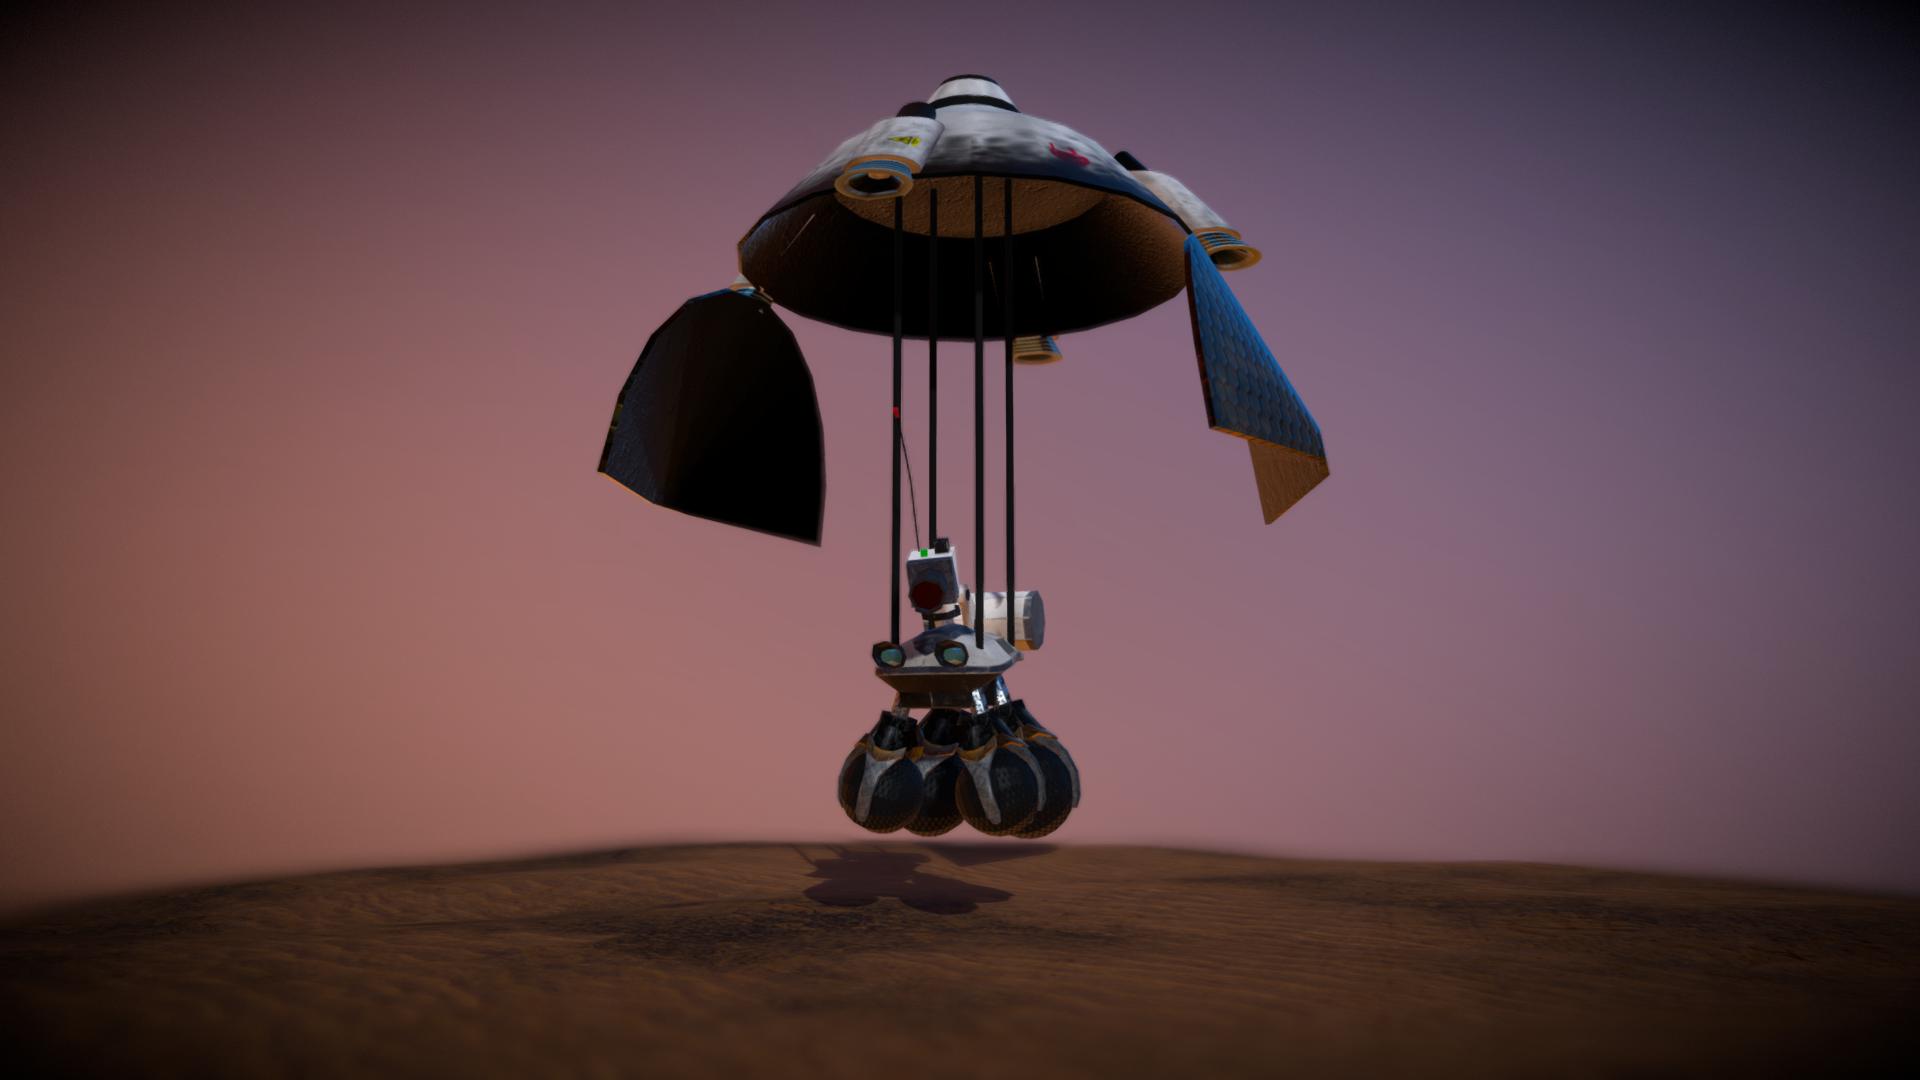 Mars Conquest - Rover